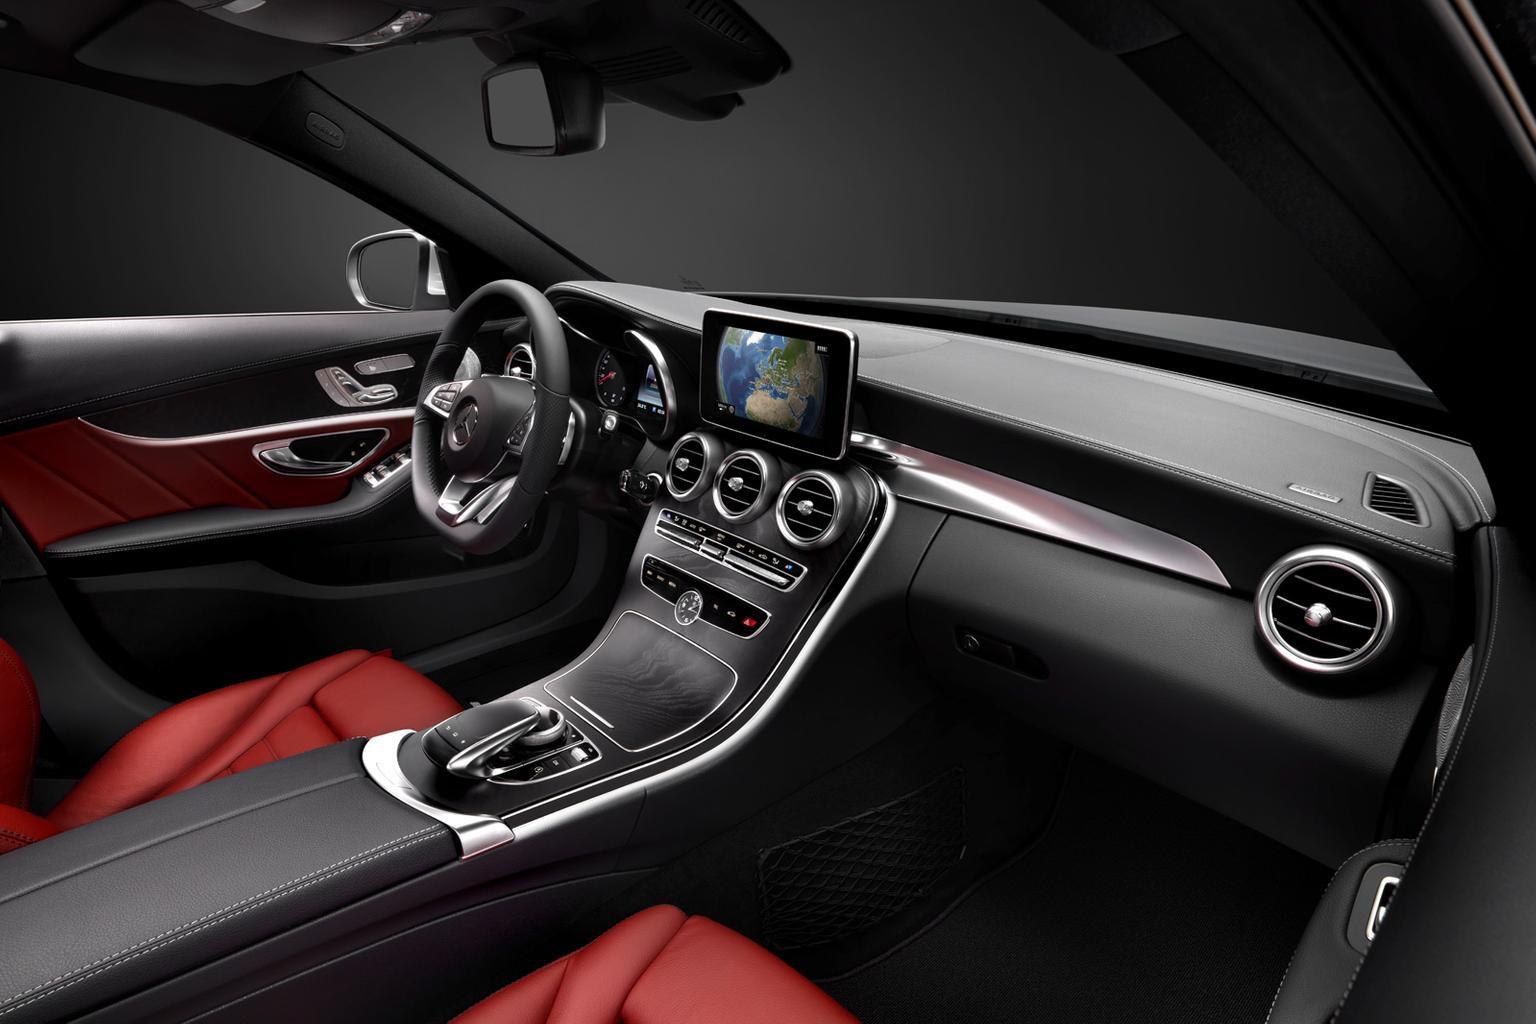 2014 Mercedes C-Class preview